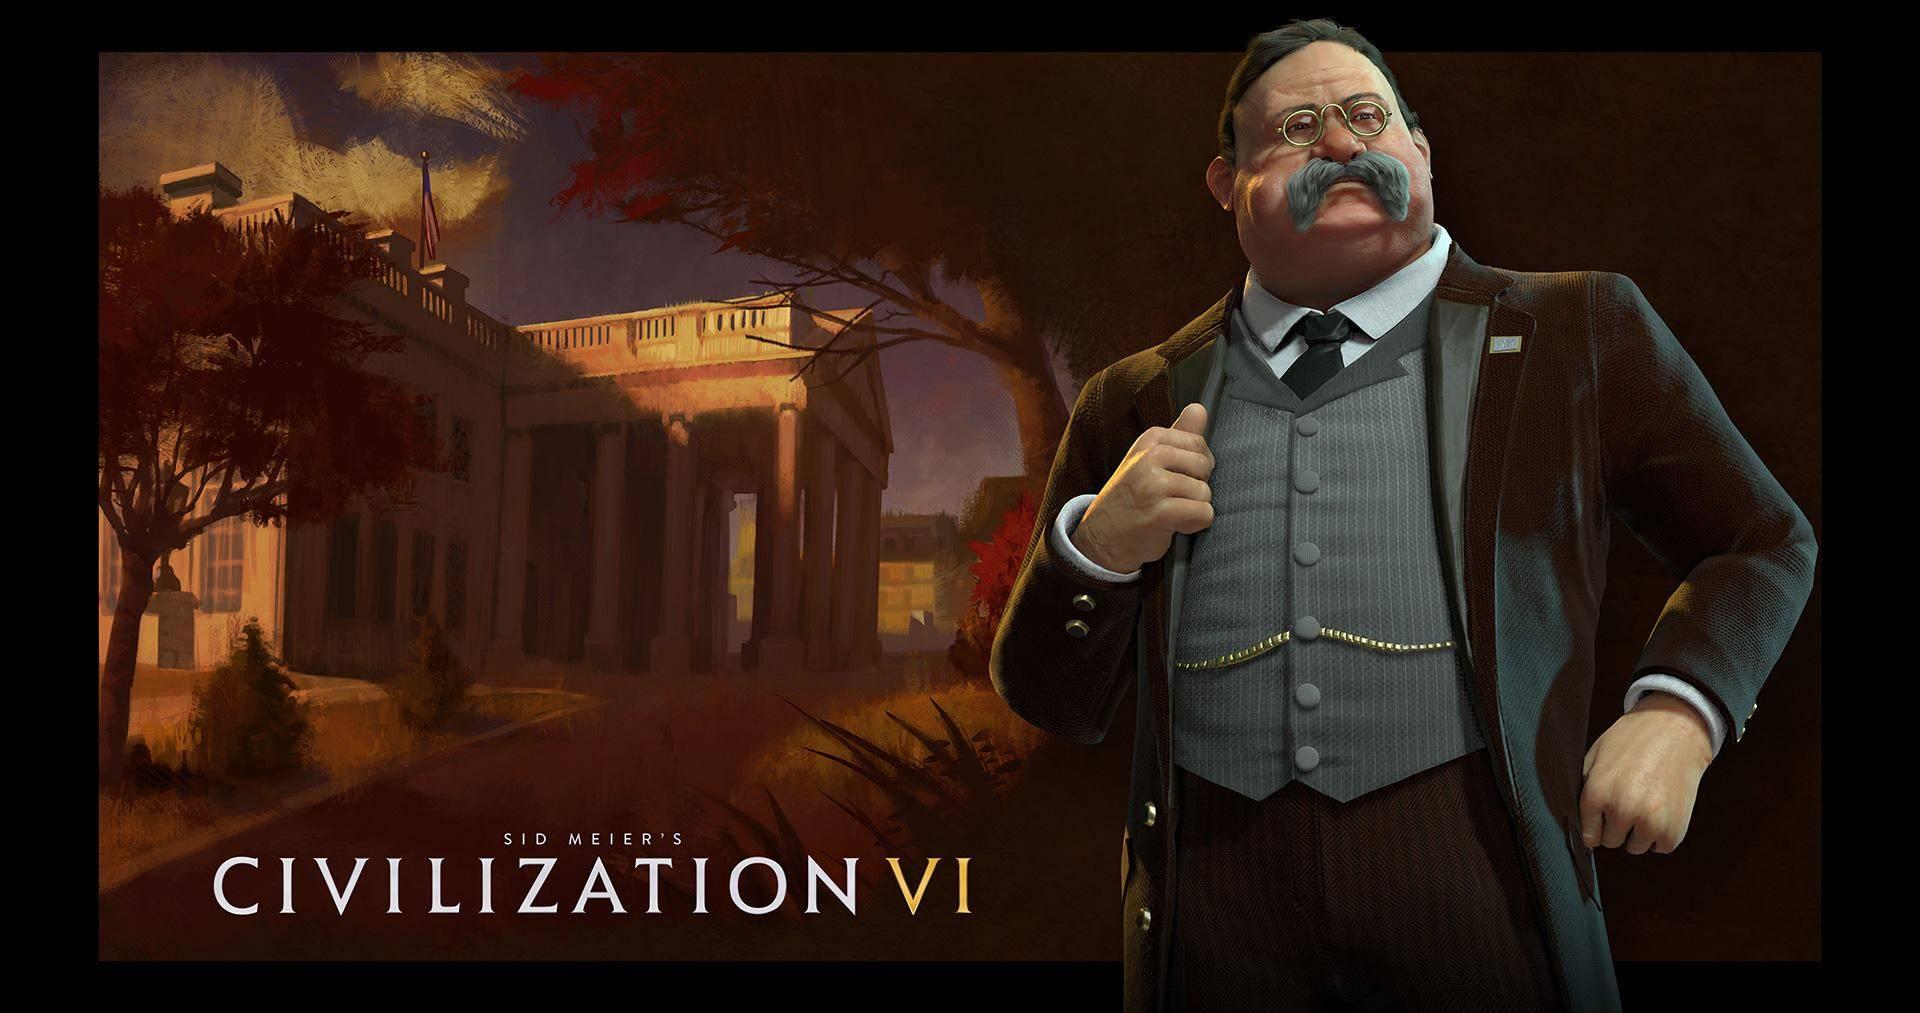 civilization-vi-game-awards-culturageek-com-ar